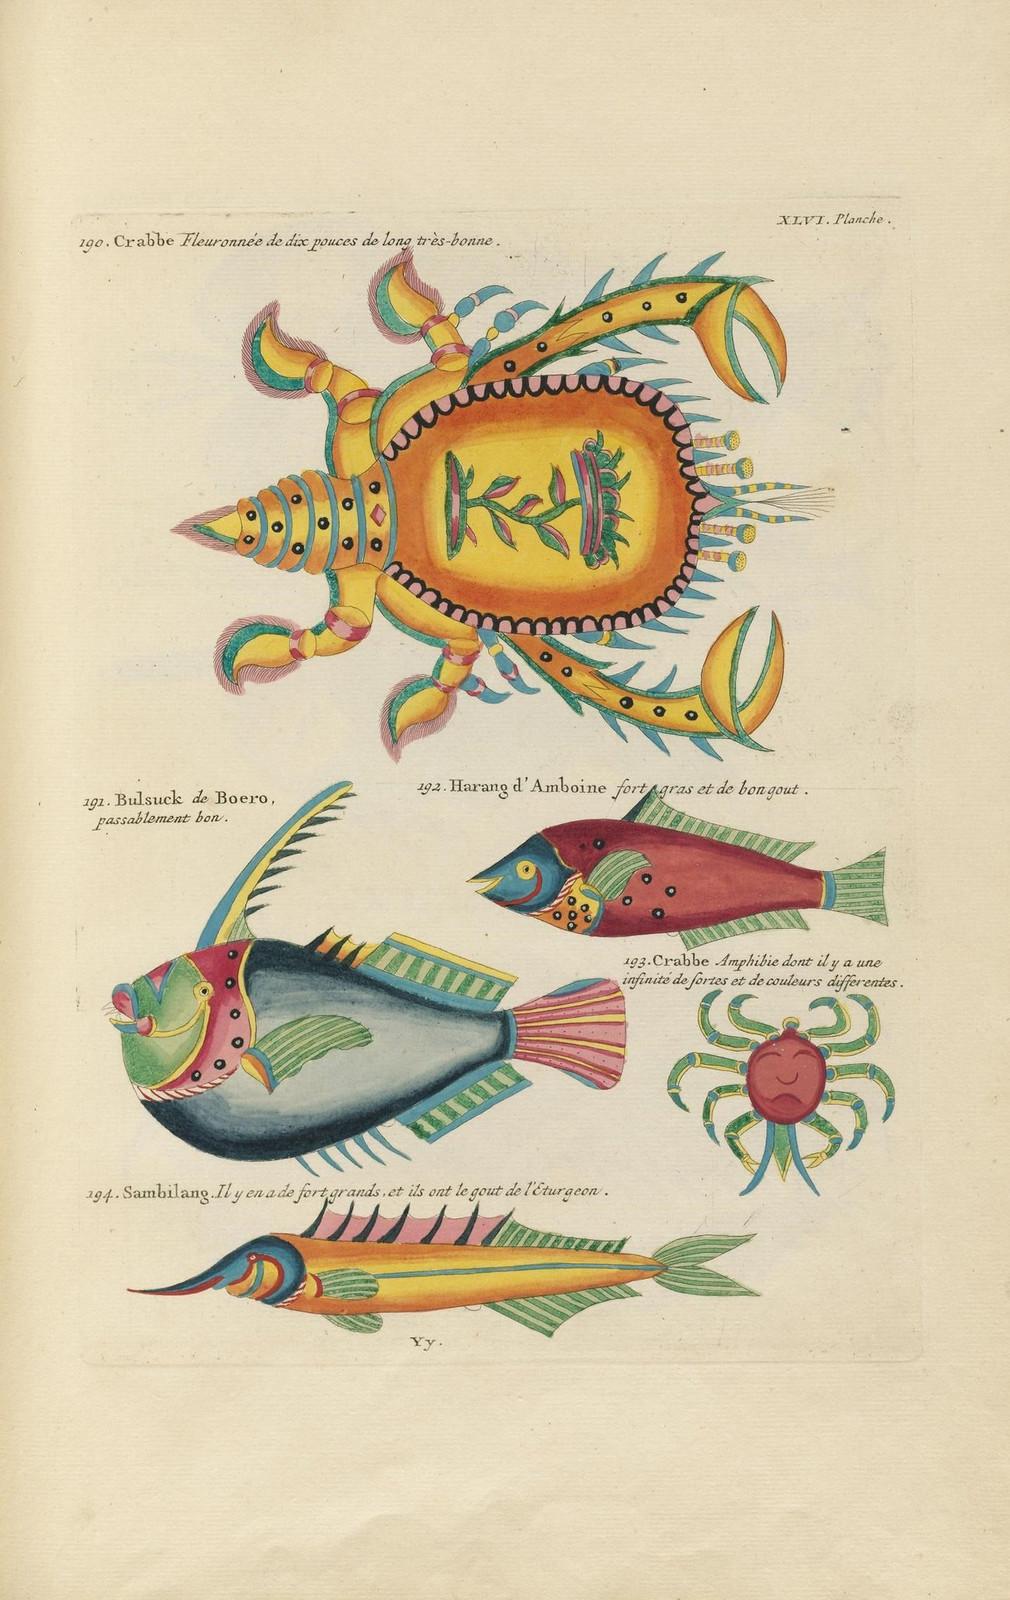 Louis Renard poissons 18